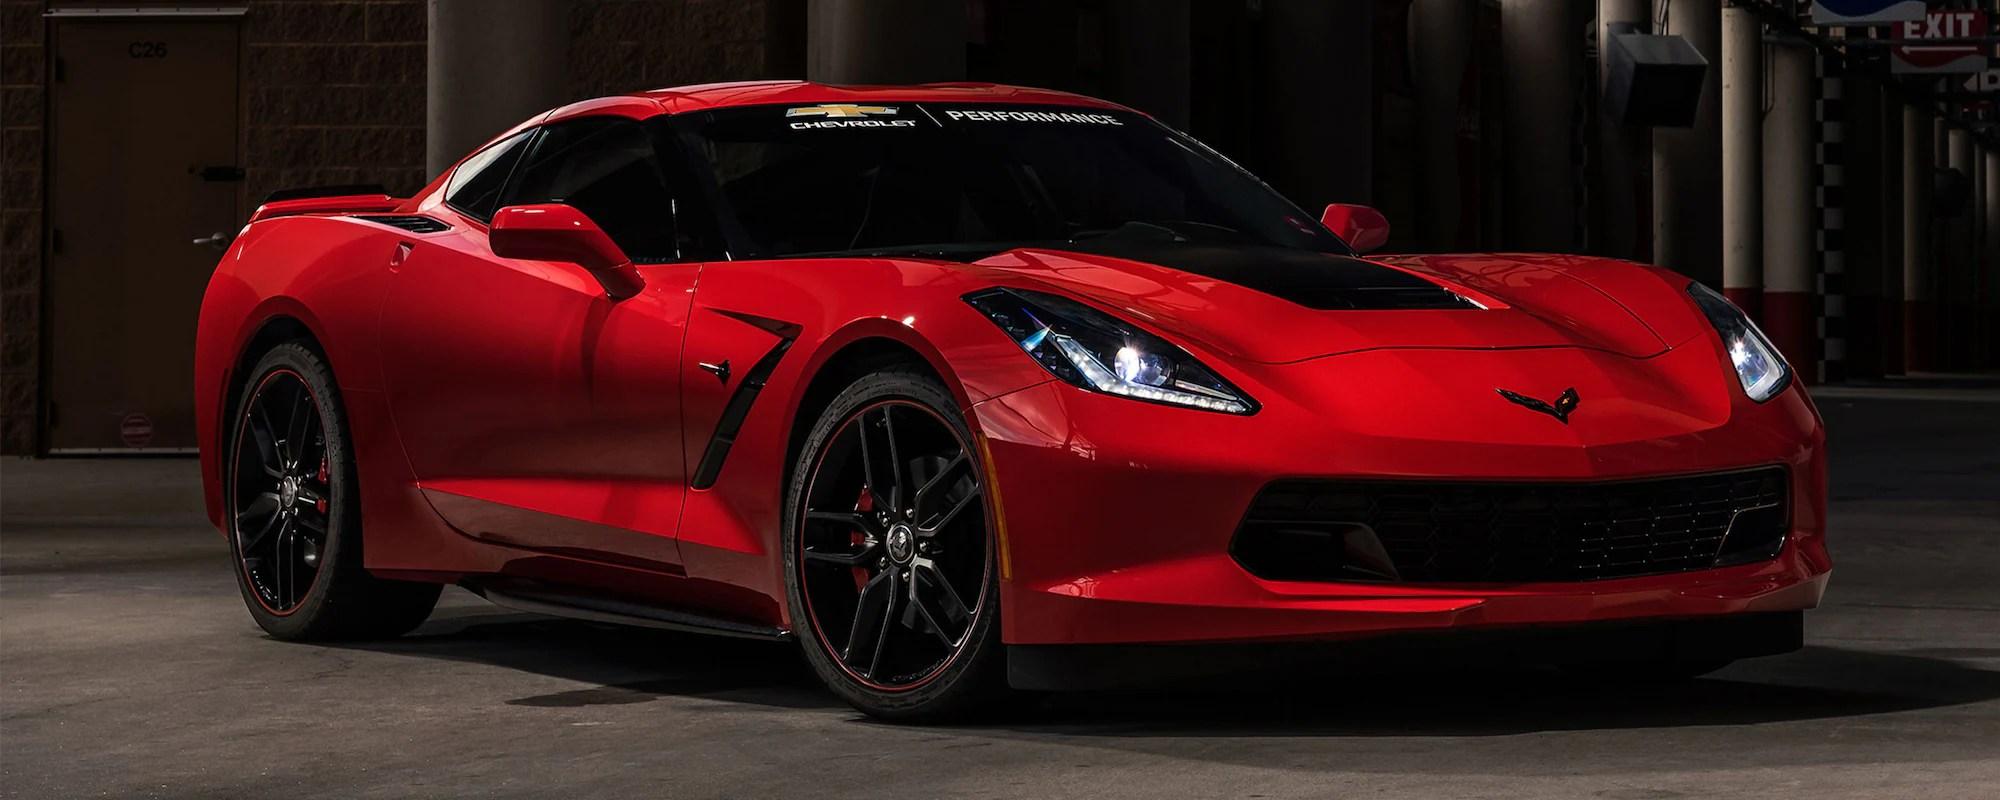 medium resolution of 2017 chevrolet corvette sports car vehicle upgrades